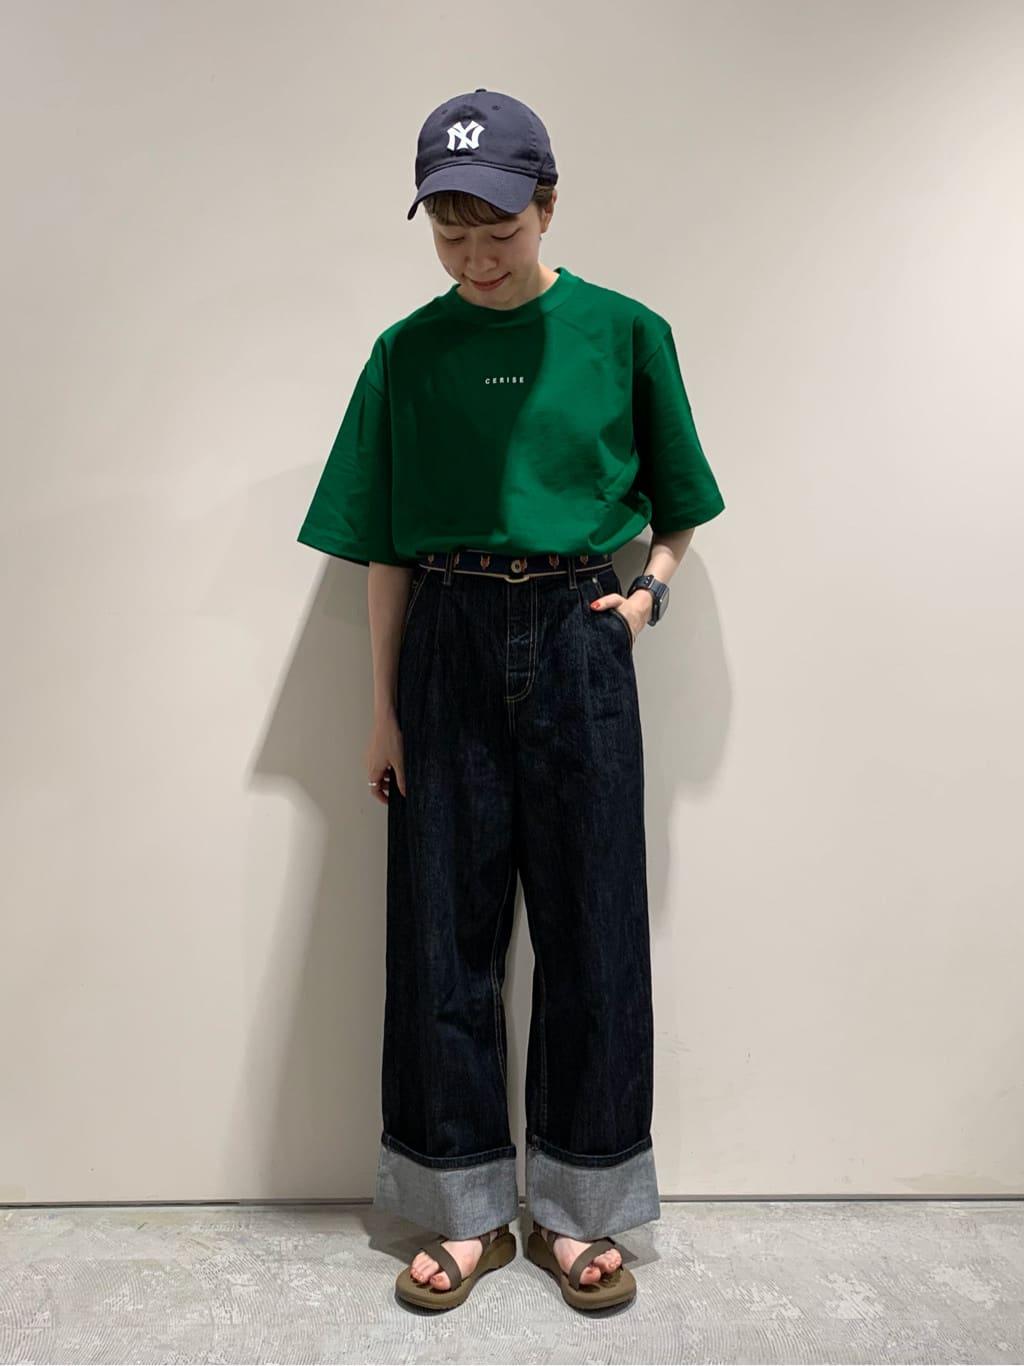 - CHILD WOMAN CHILD WOMAN , PAR ICI ルミネ横浜 身長:158cm 2021.07.26